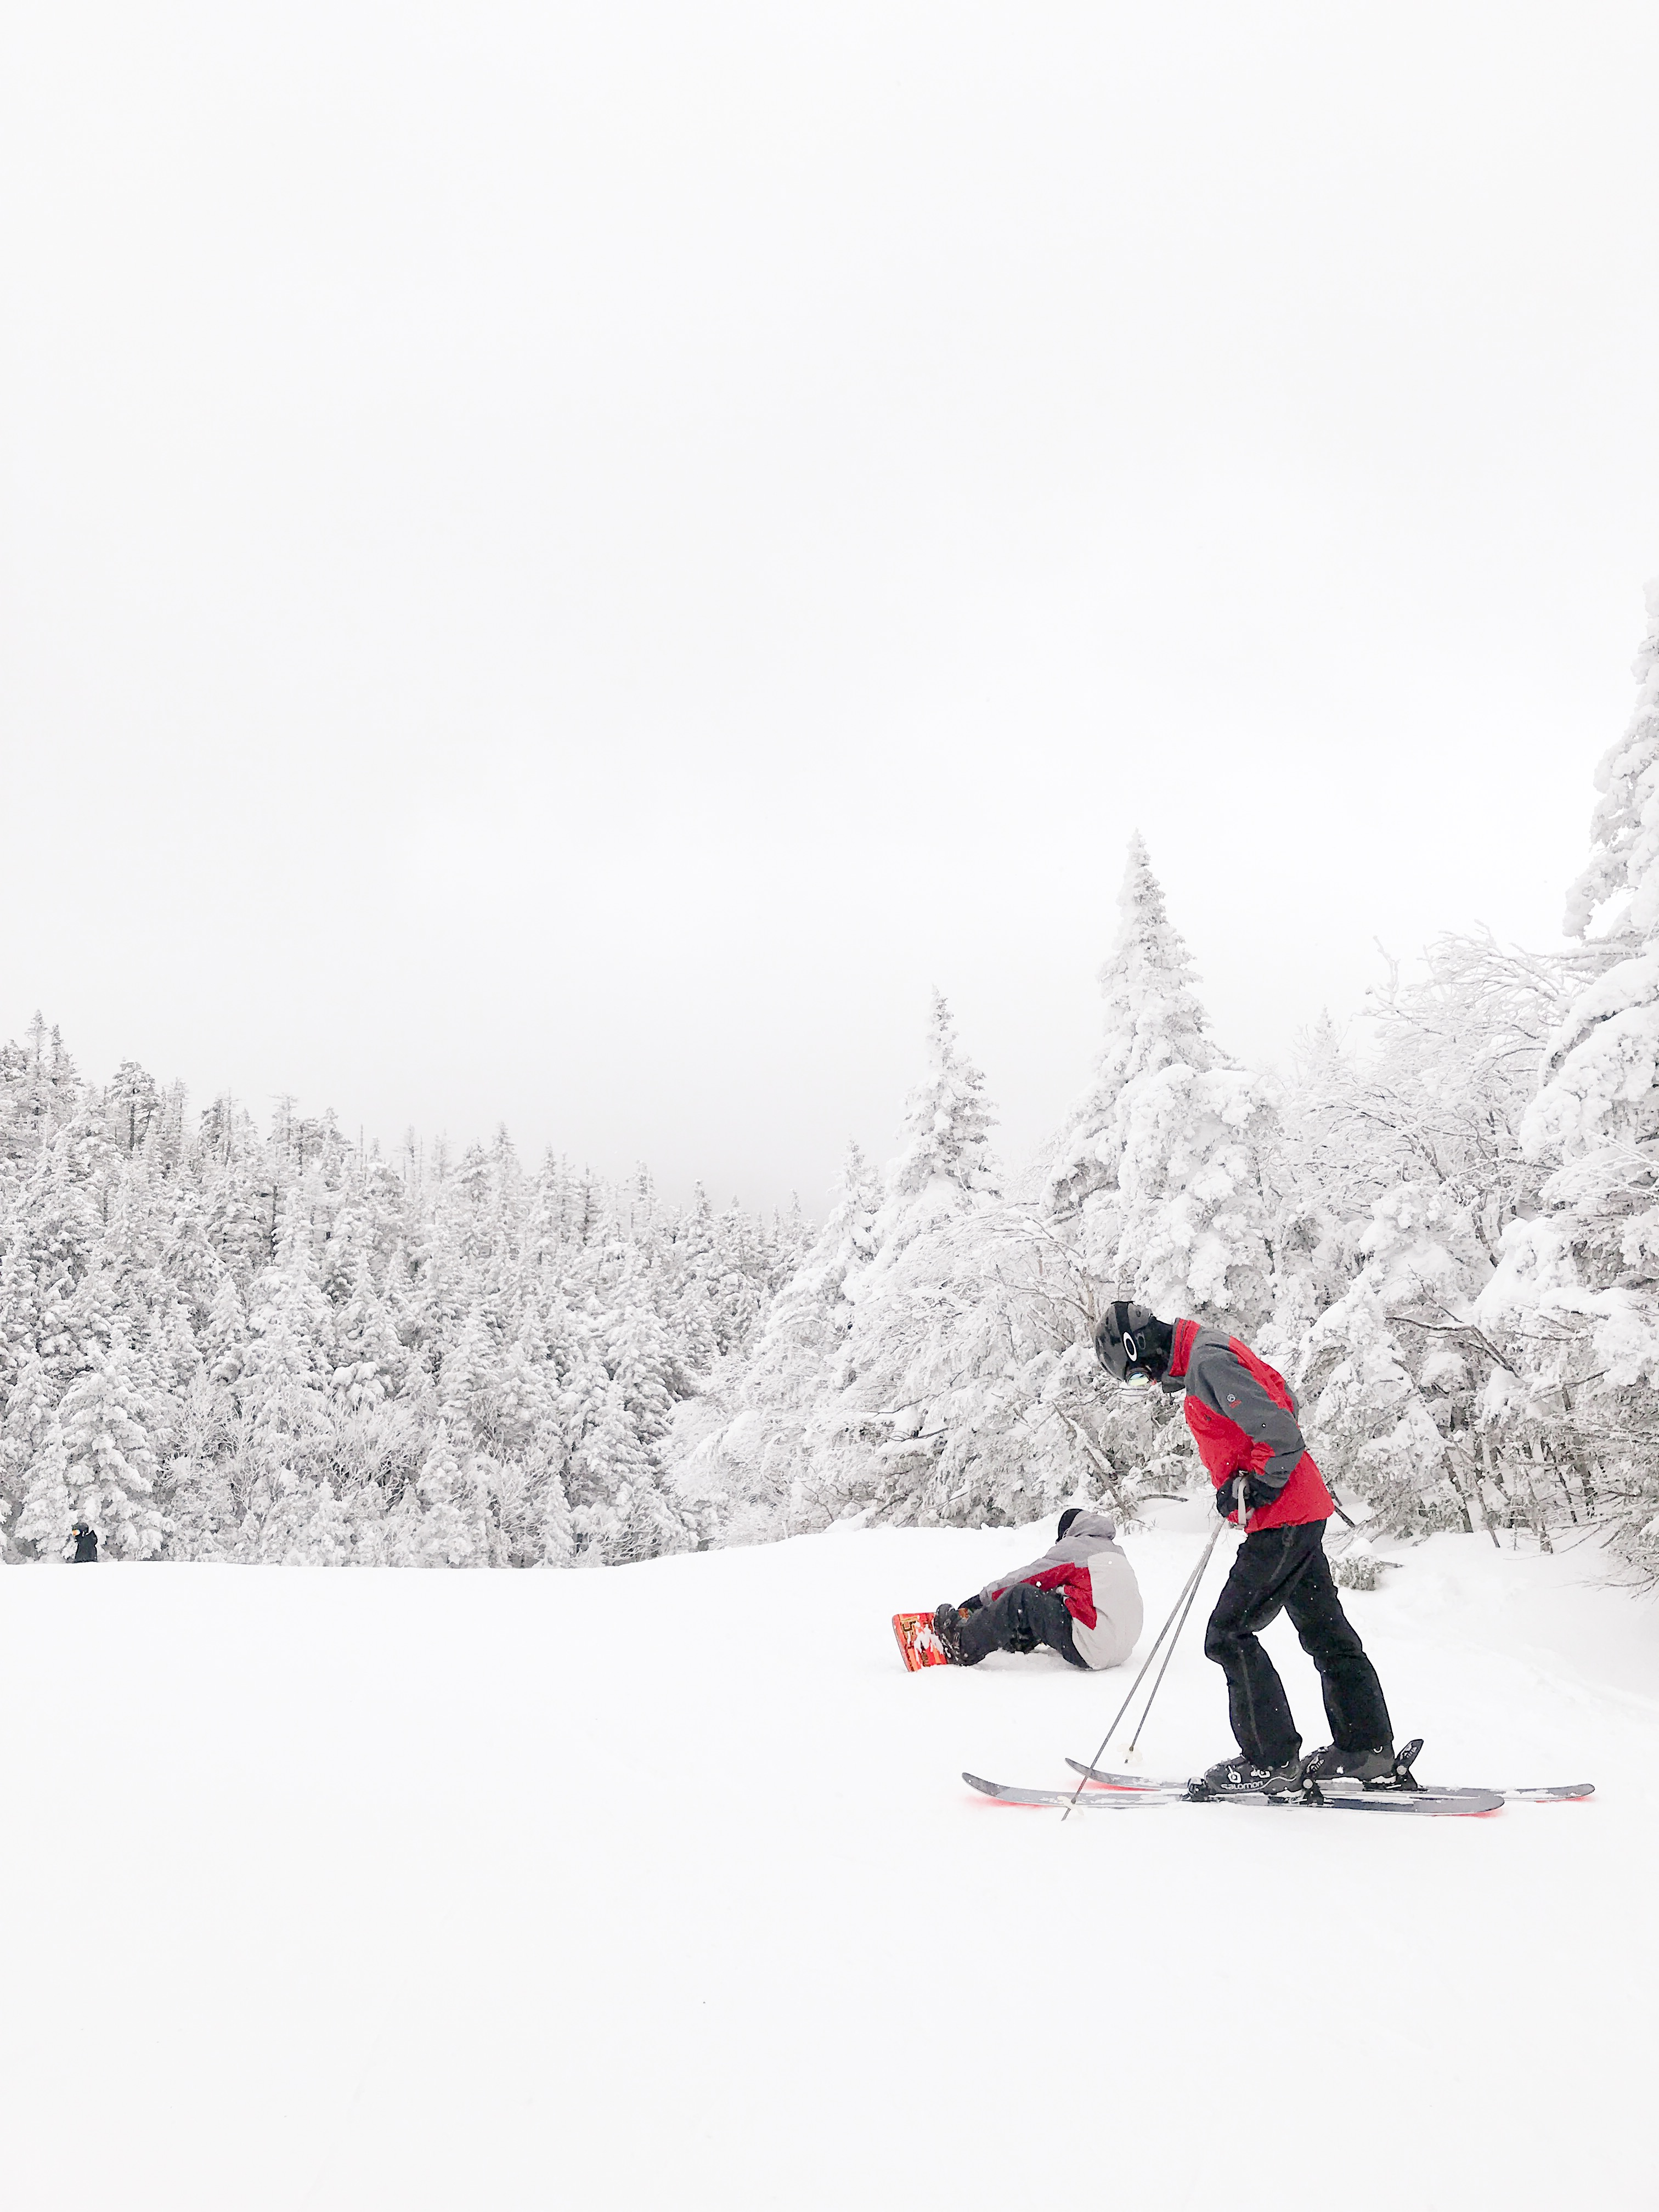 ski resorts close to maryland